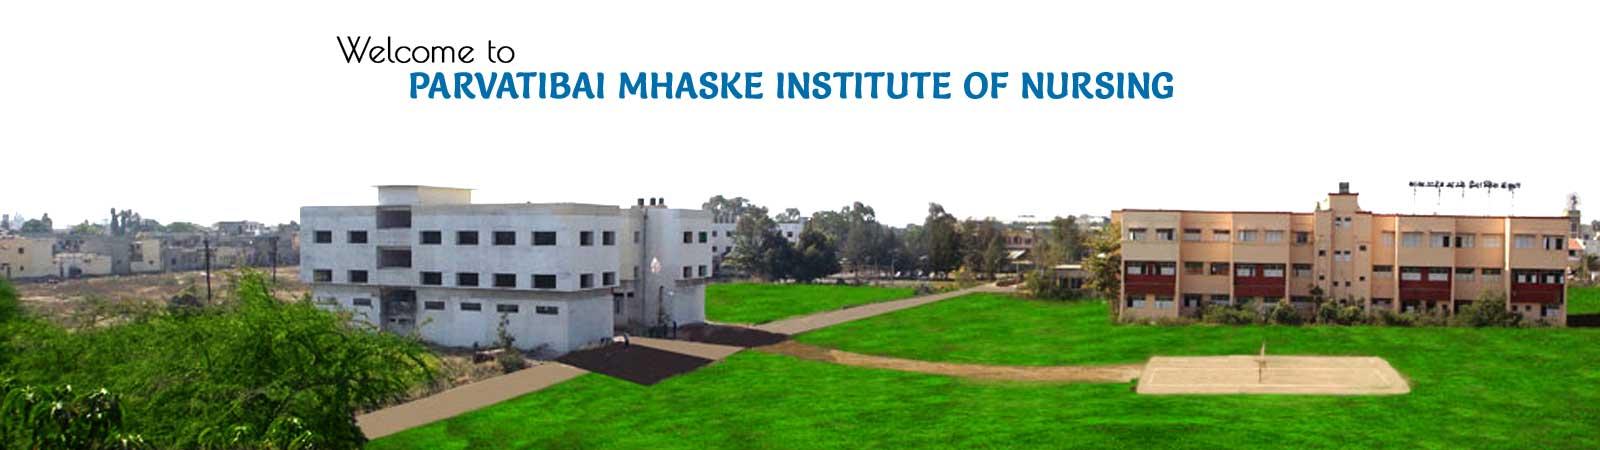 Parvatibai Mhaske Institute Of Nursing, Ahmednagar Image